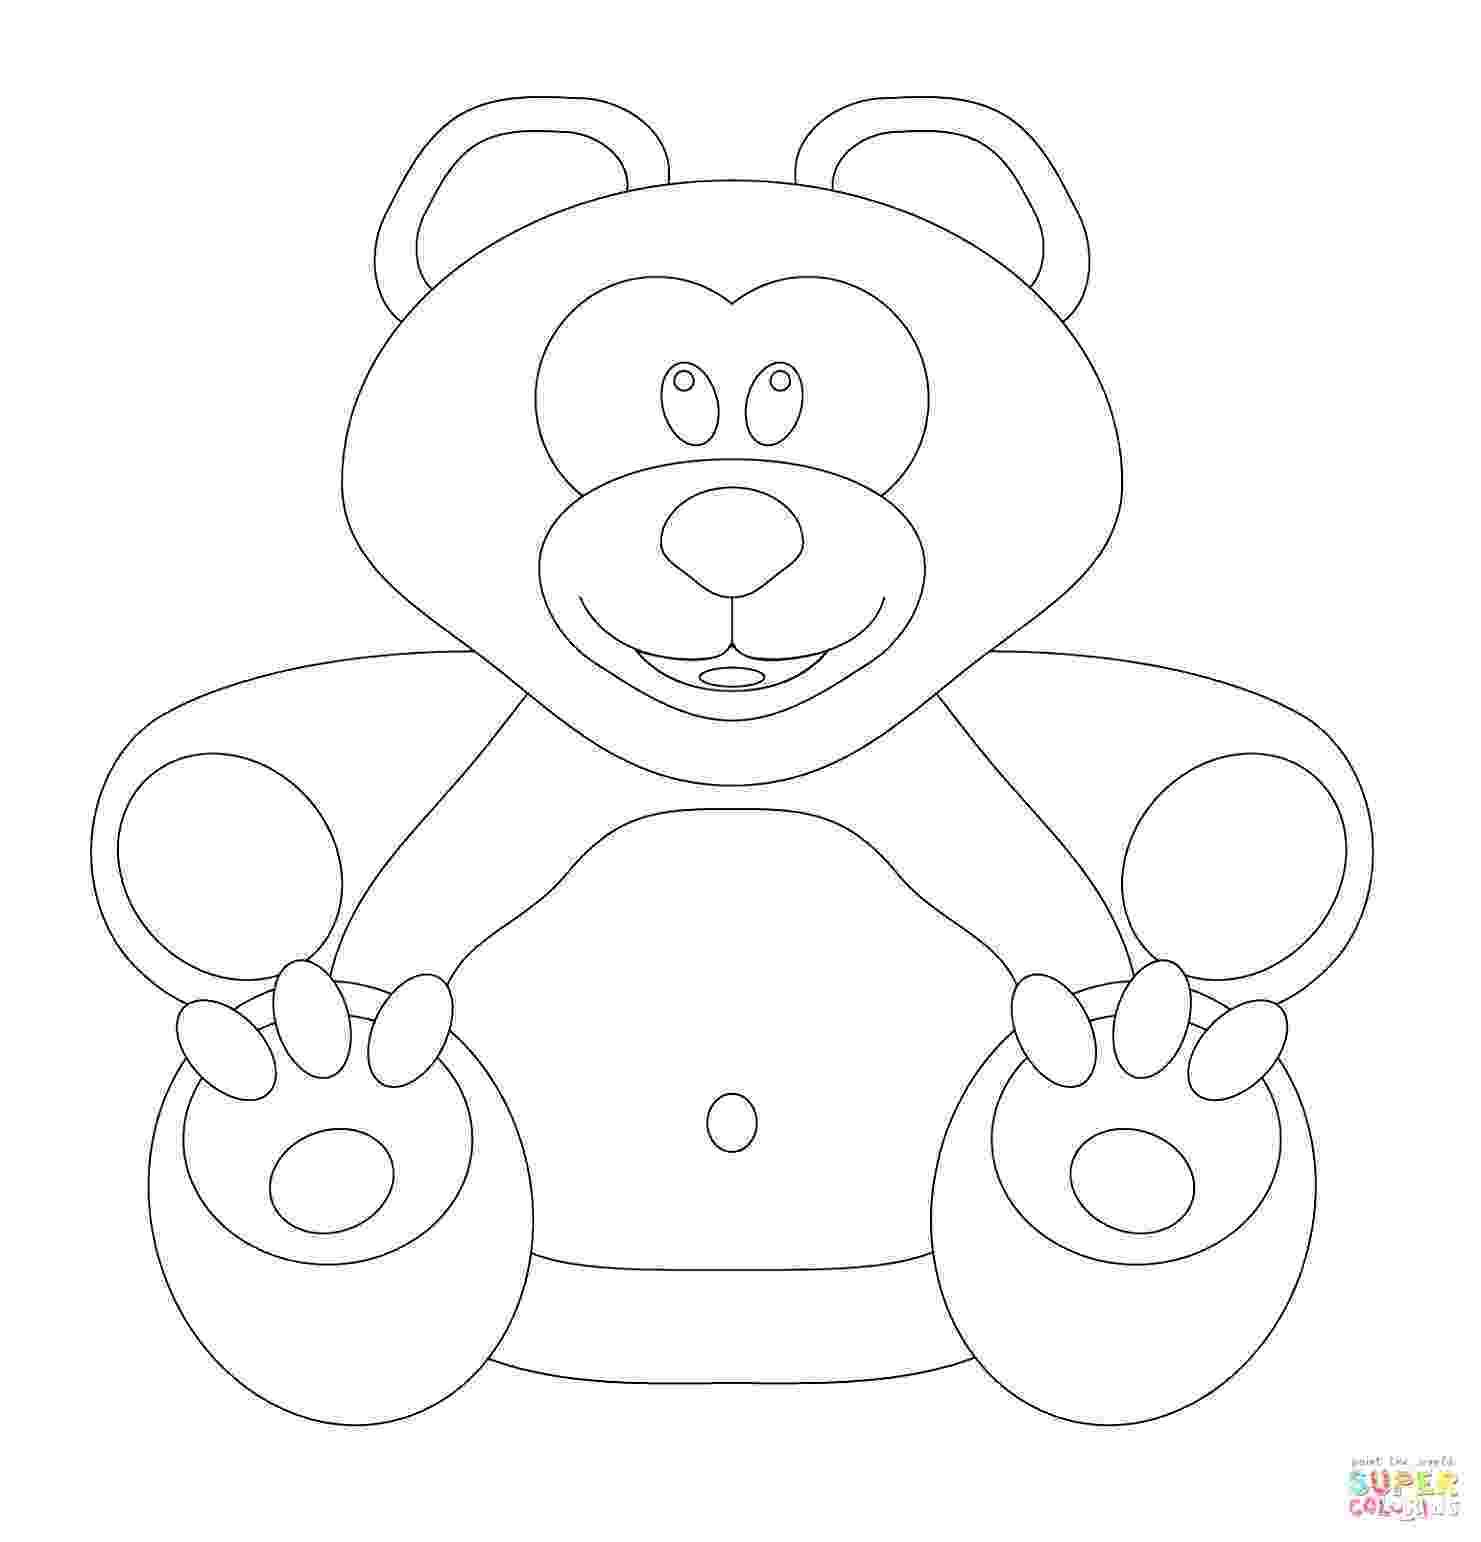 pudsey bear template printables pudsey bear template sketch coloring page bear pudsey printables template